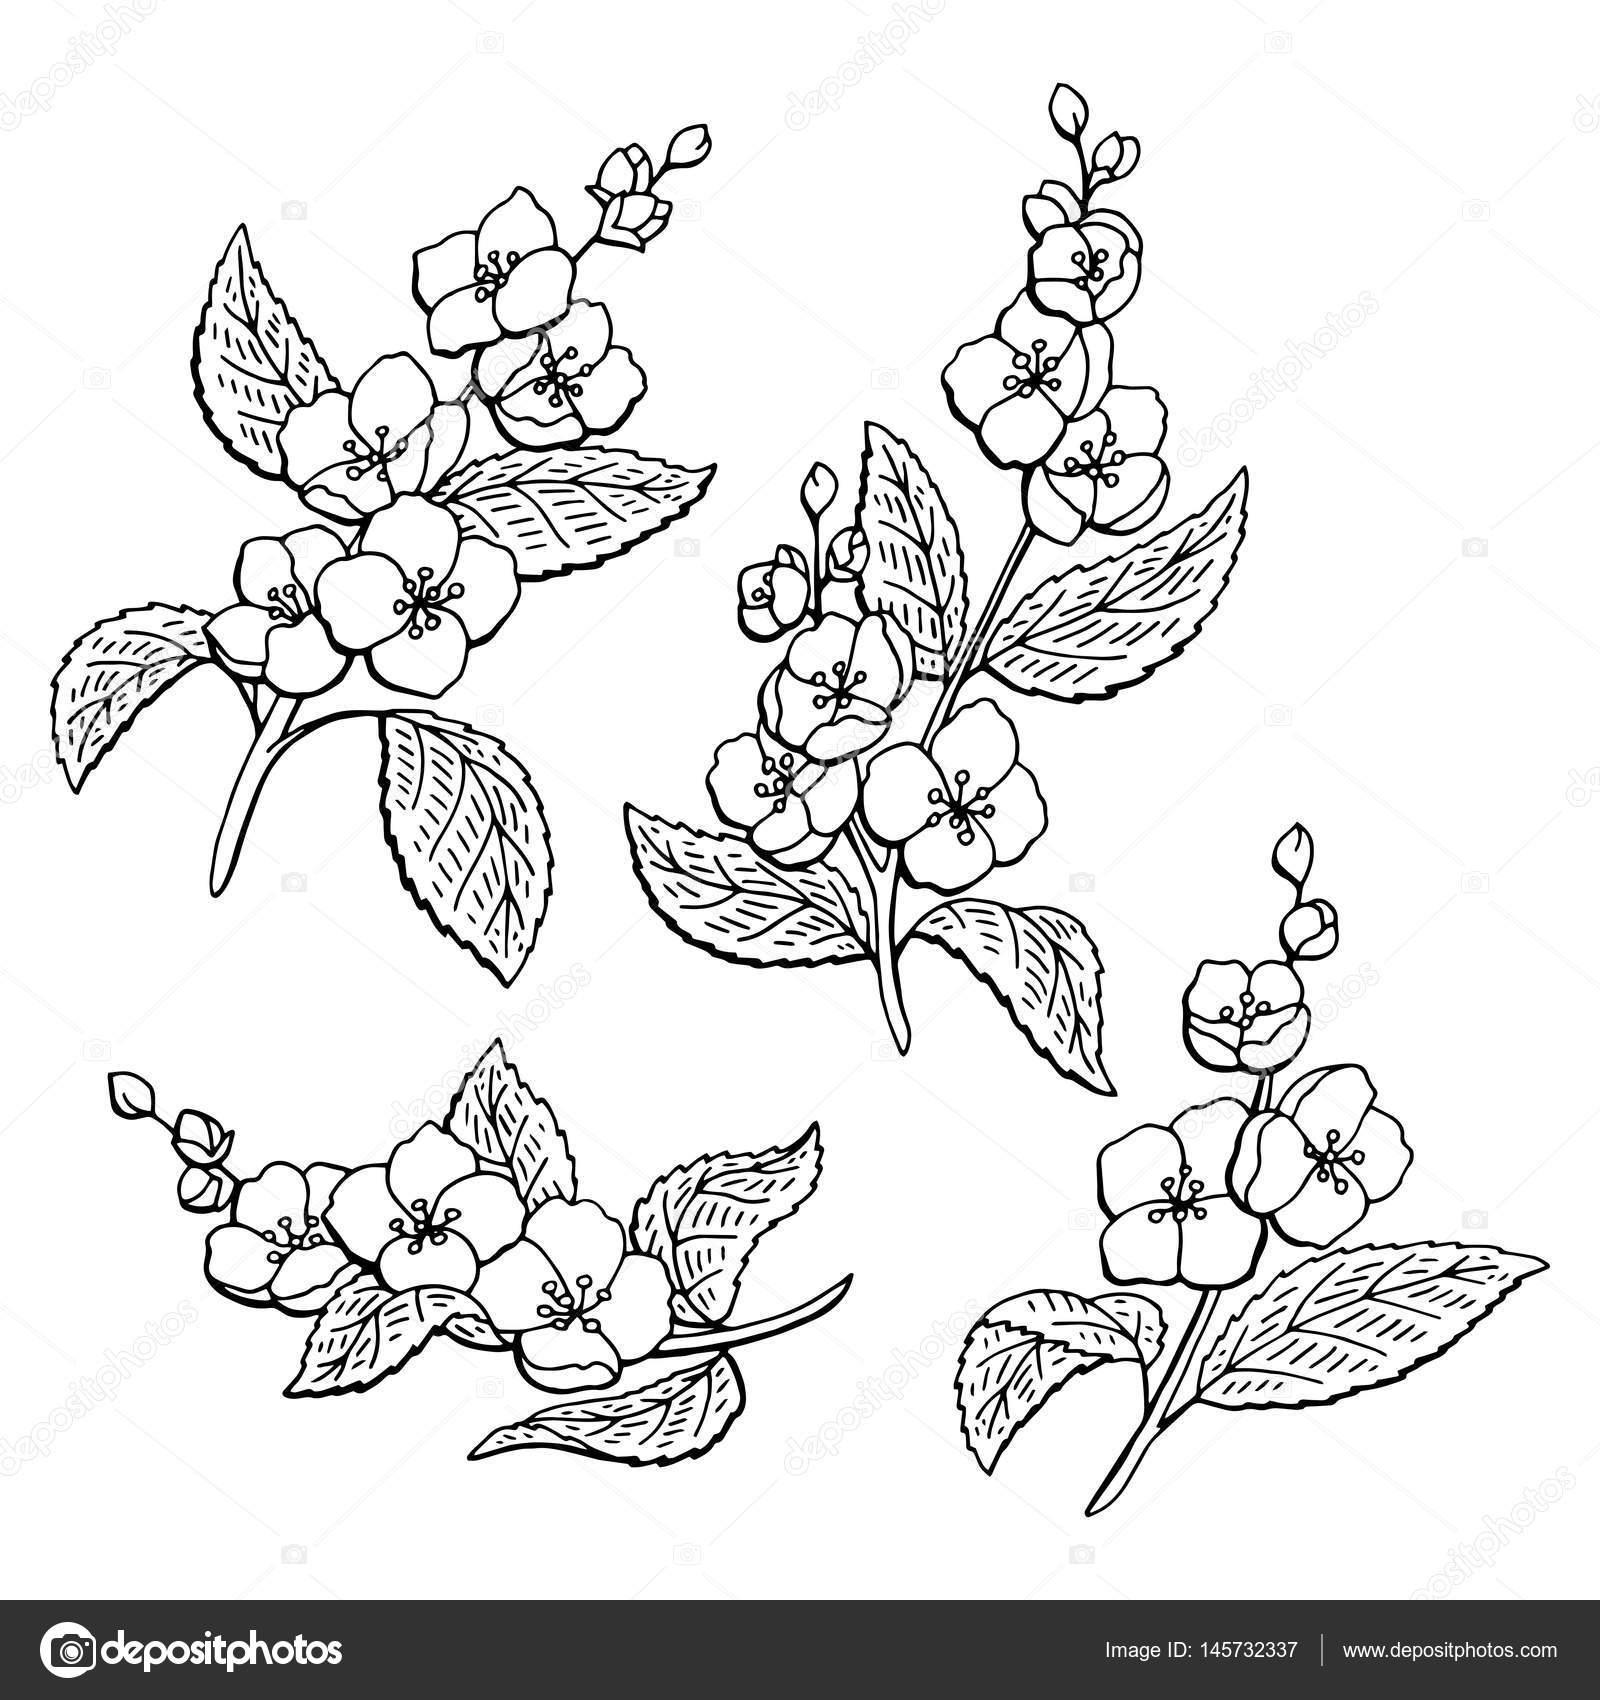 Jasmine Flower Graphic Black White Isolated Sketch